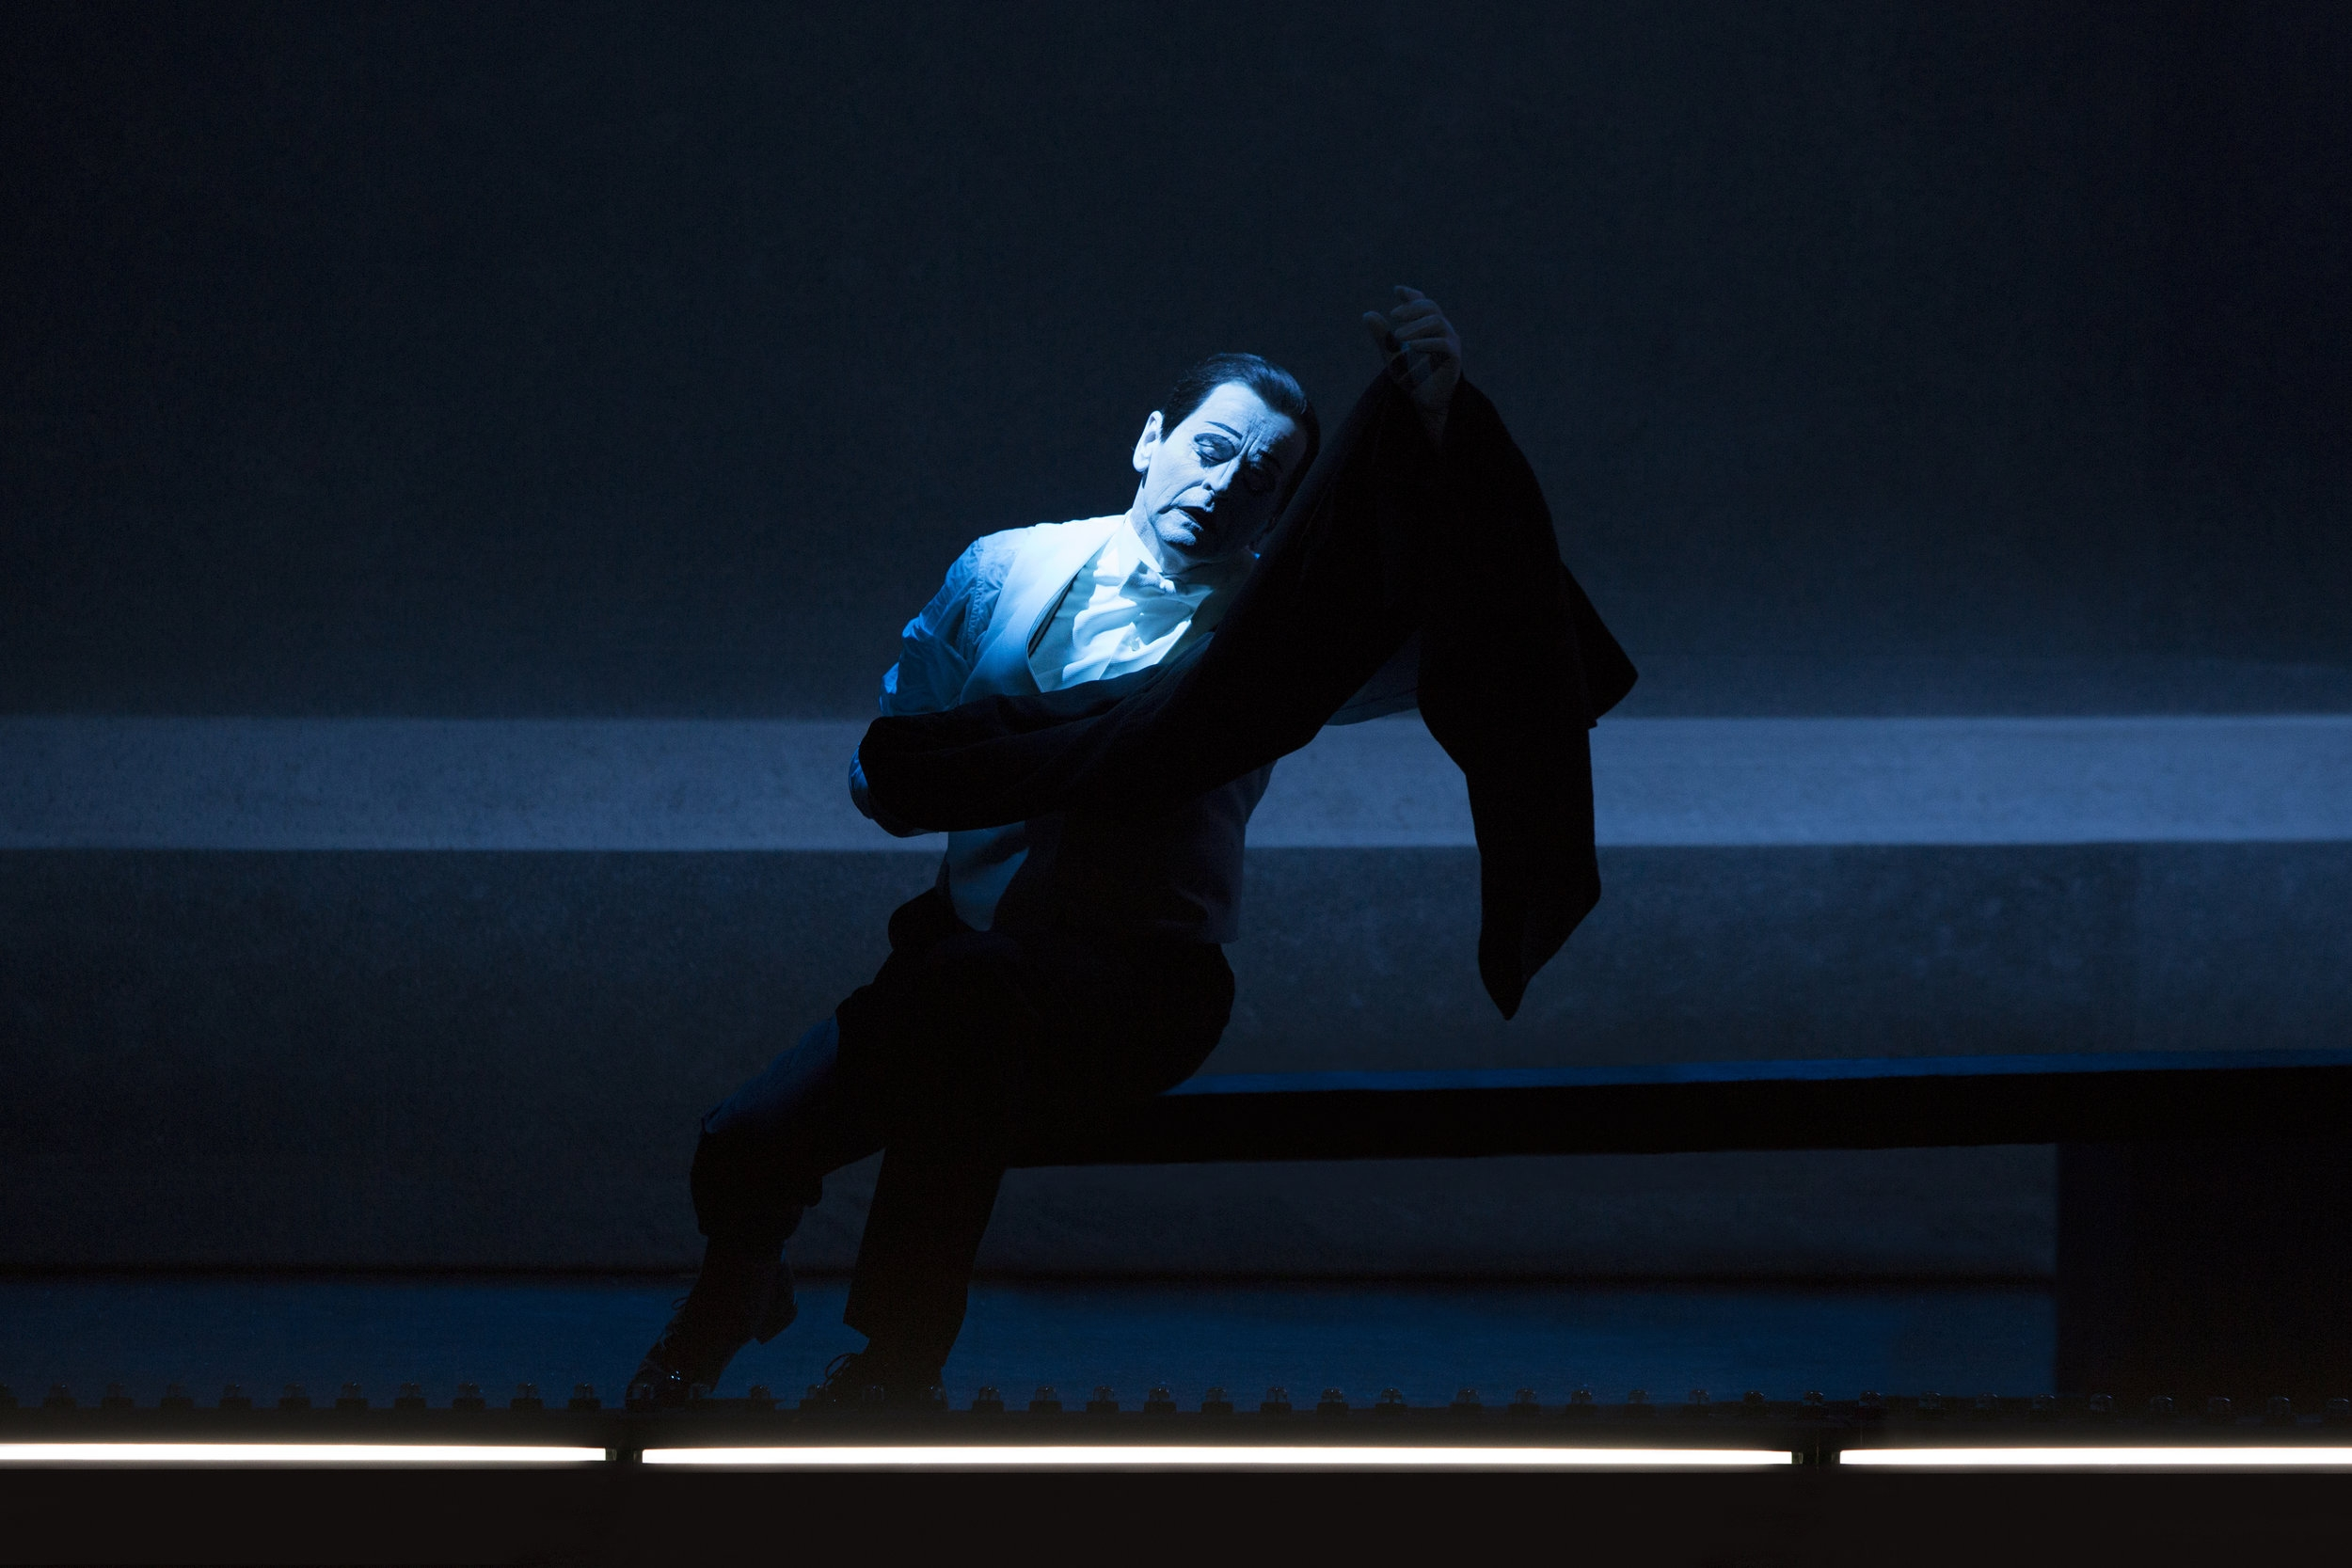 Scene II A - Mikhail Baryshnikov (Spoleto, 2015)